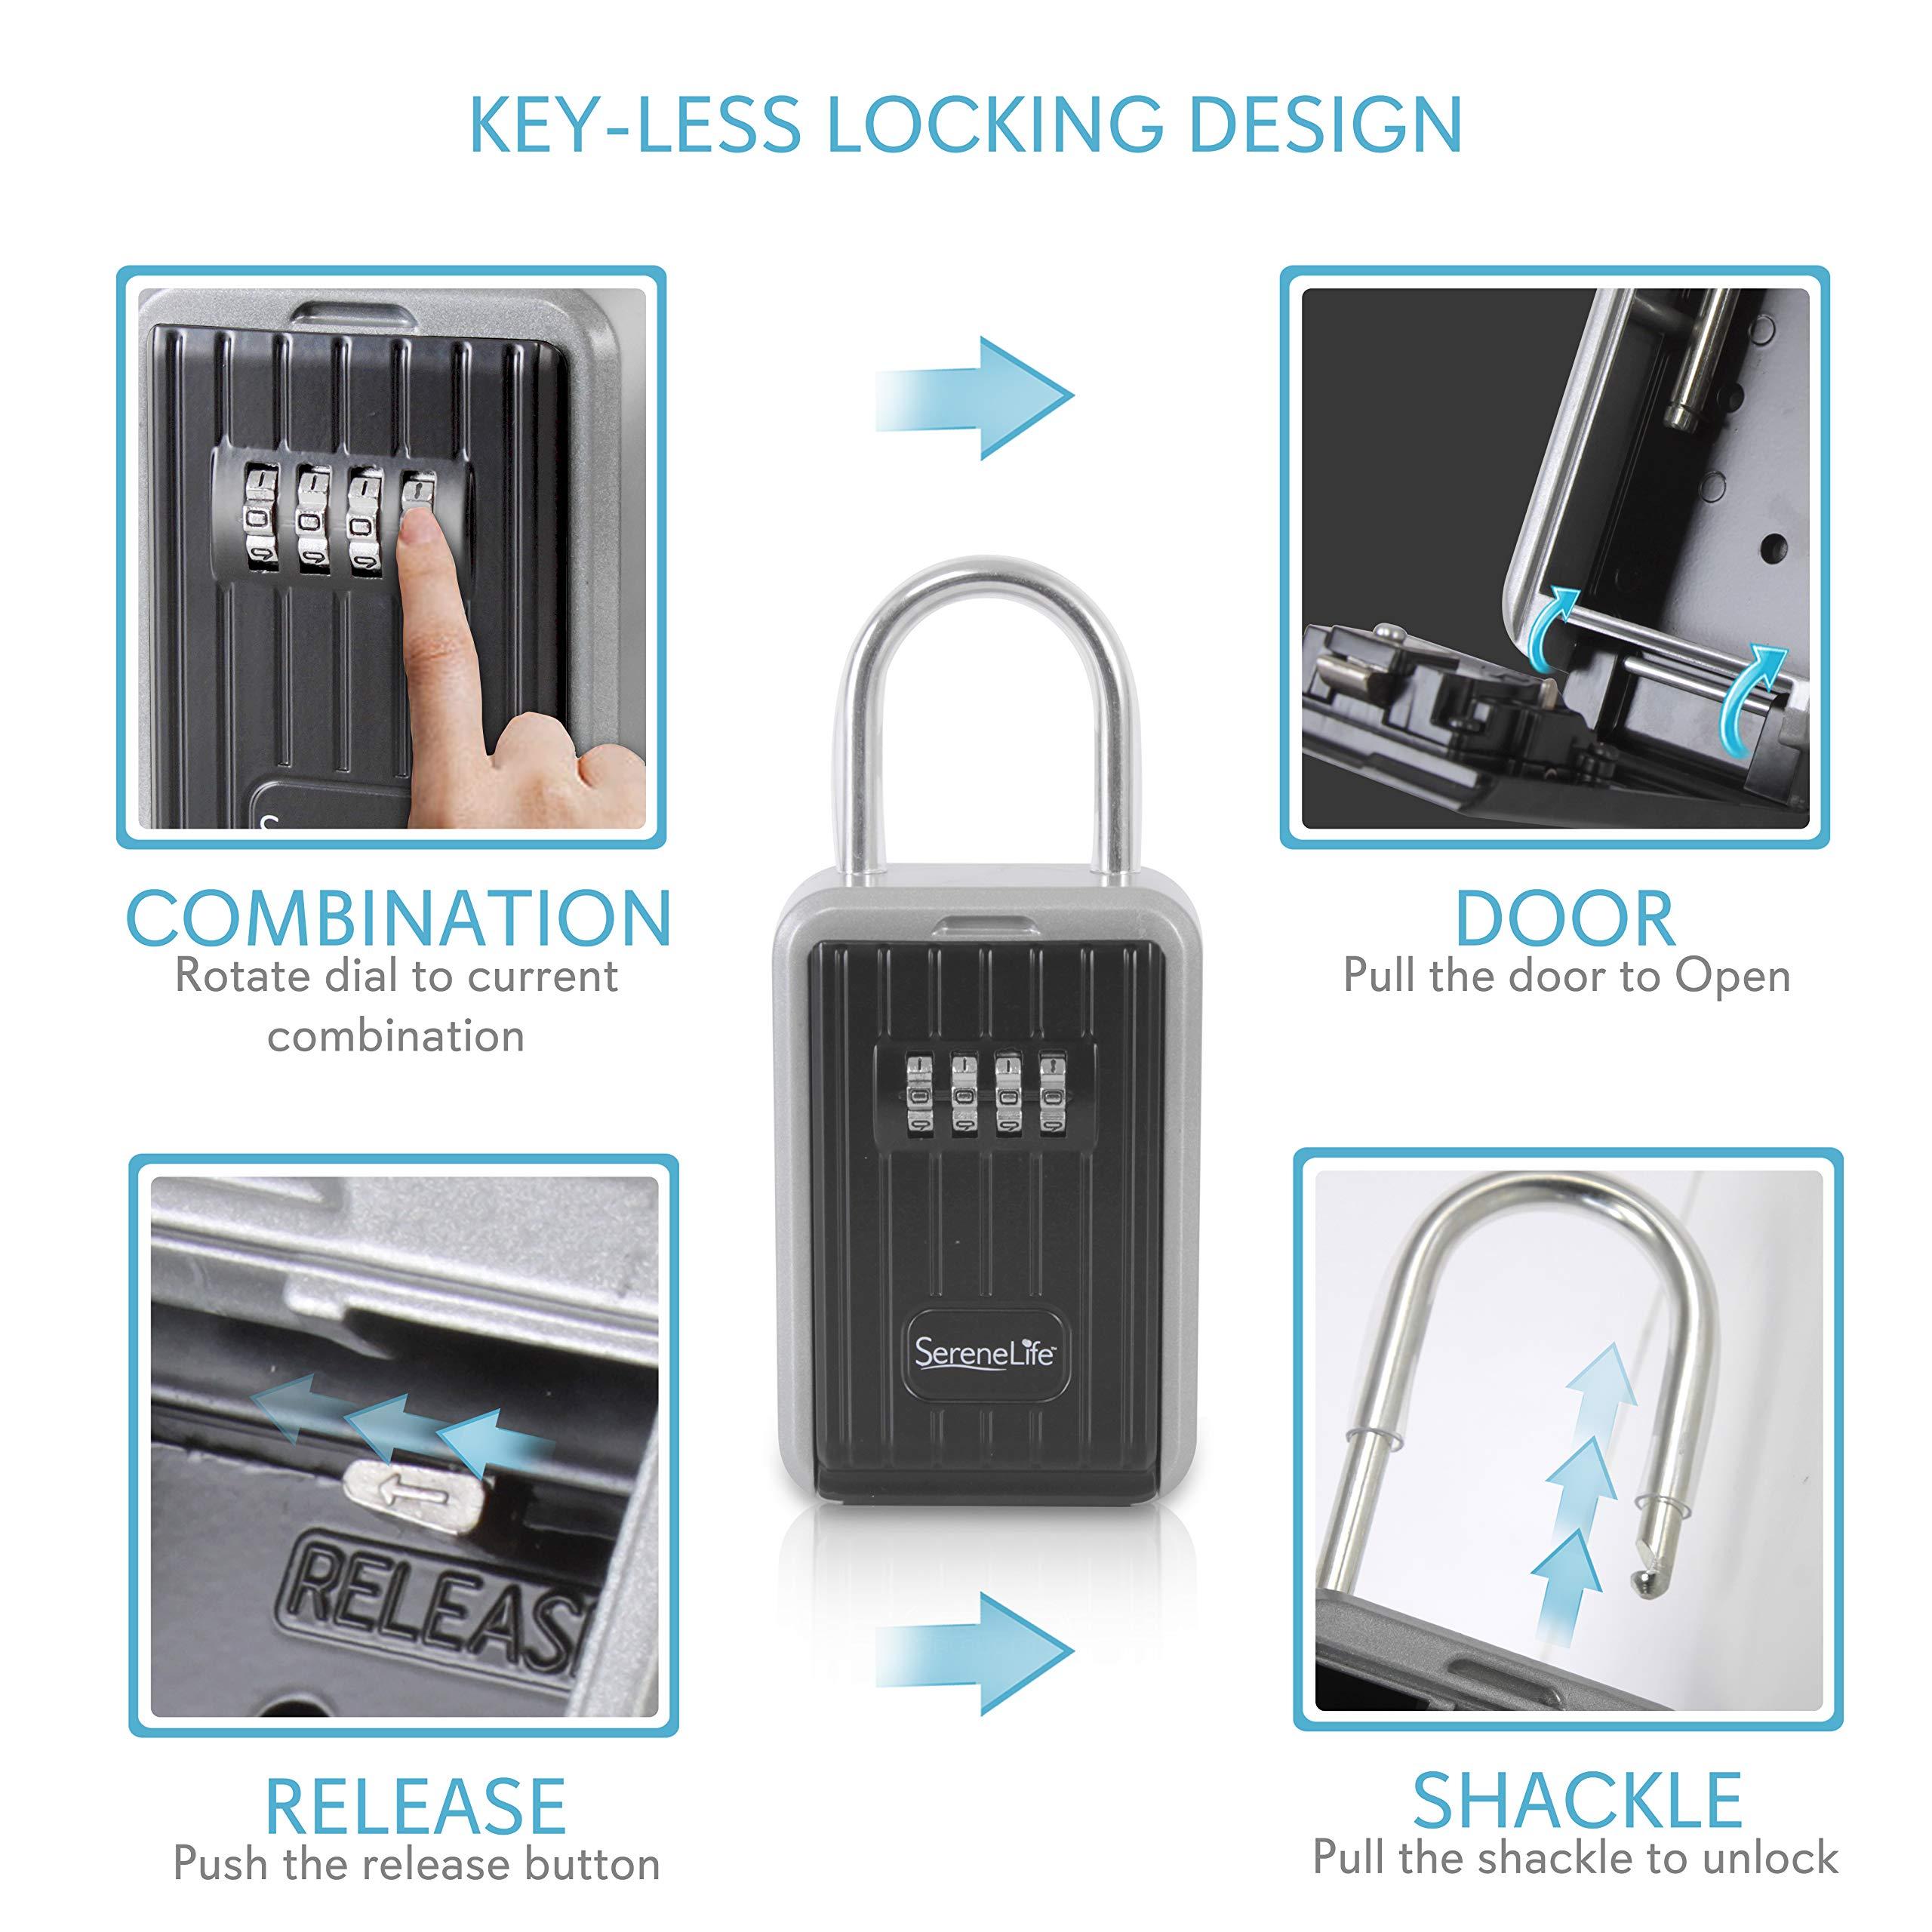 SereneLife SLSFKEY29 Serene Life Key Safe Security Box Locker-Wall Mount Steel Metal Key Holder Keeper with Lock Up to 60 Spare Door Keys Storage Two Cabinet Door Keys For Secure Home Office